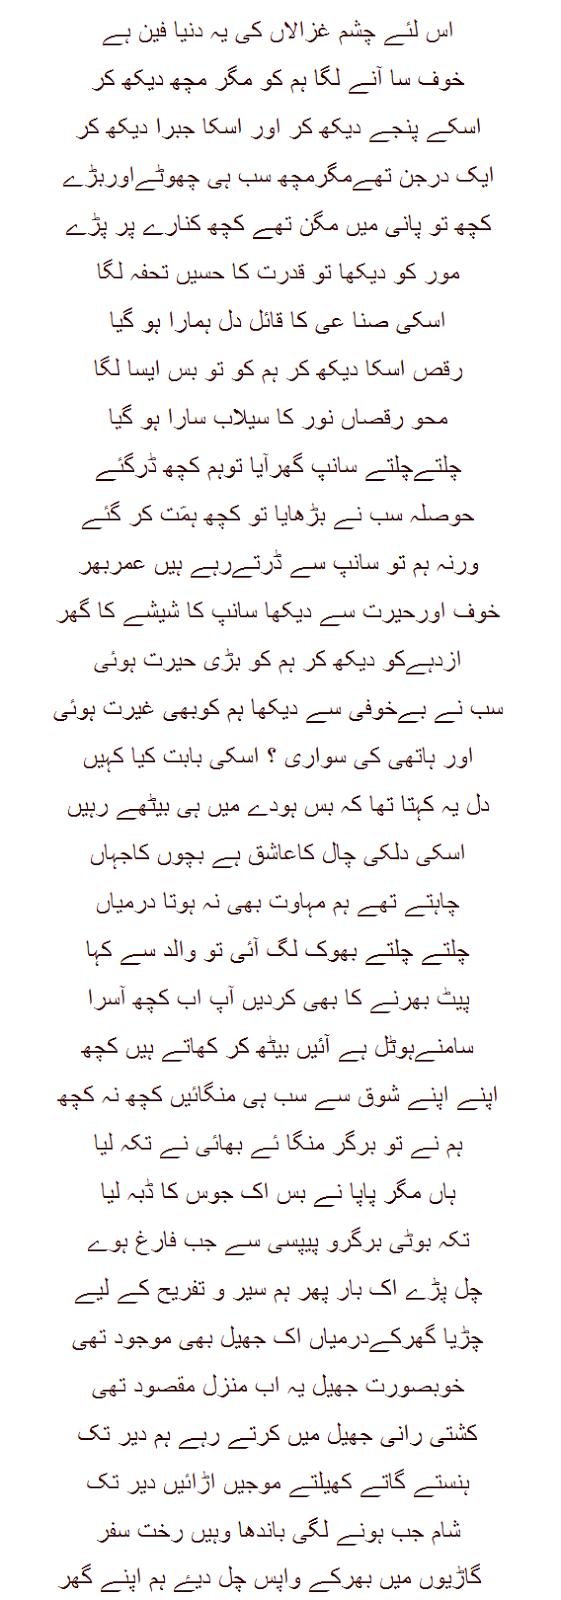 chidiya ghar ki sair essay in urdu zoo a to zoo essay in chidiya ghar mazmoon in hindi